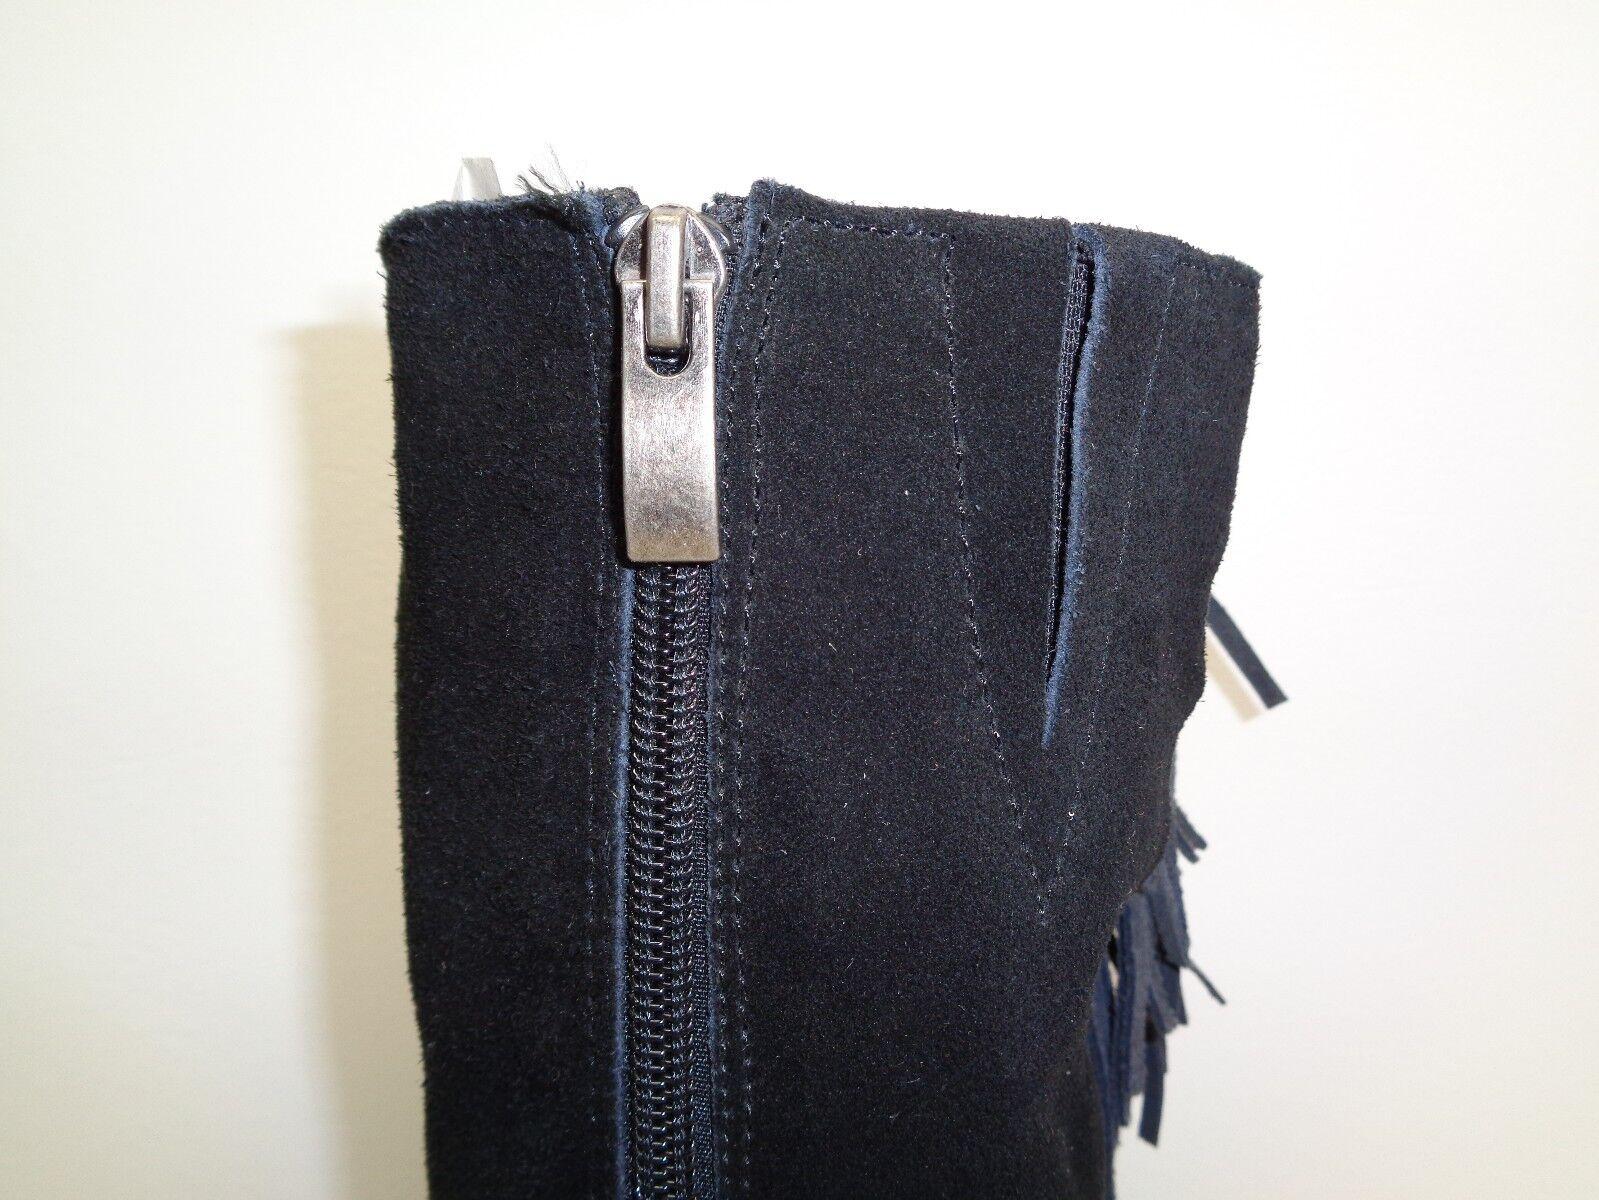 Reba Talla 6 cowgirly Negro Pantorrilla Flecos de Gamuza Tacones Mitad de Pantorrilla Negro botas nuevo Zapatos para mujer 87e96e